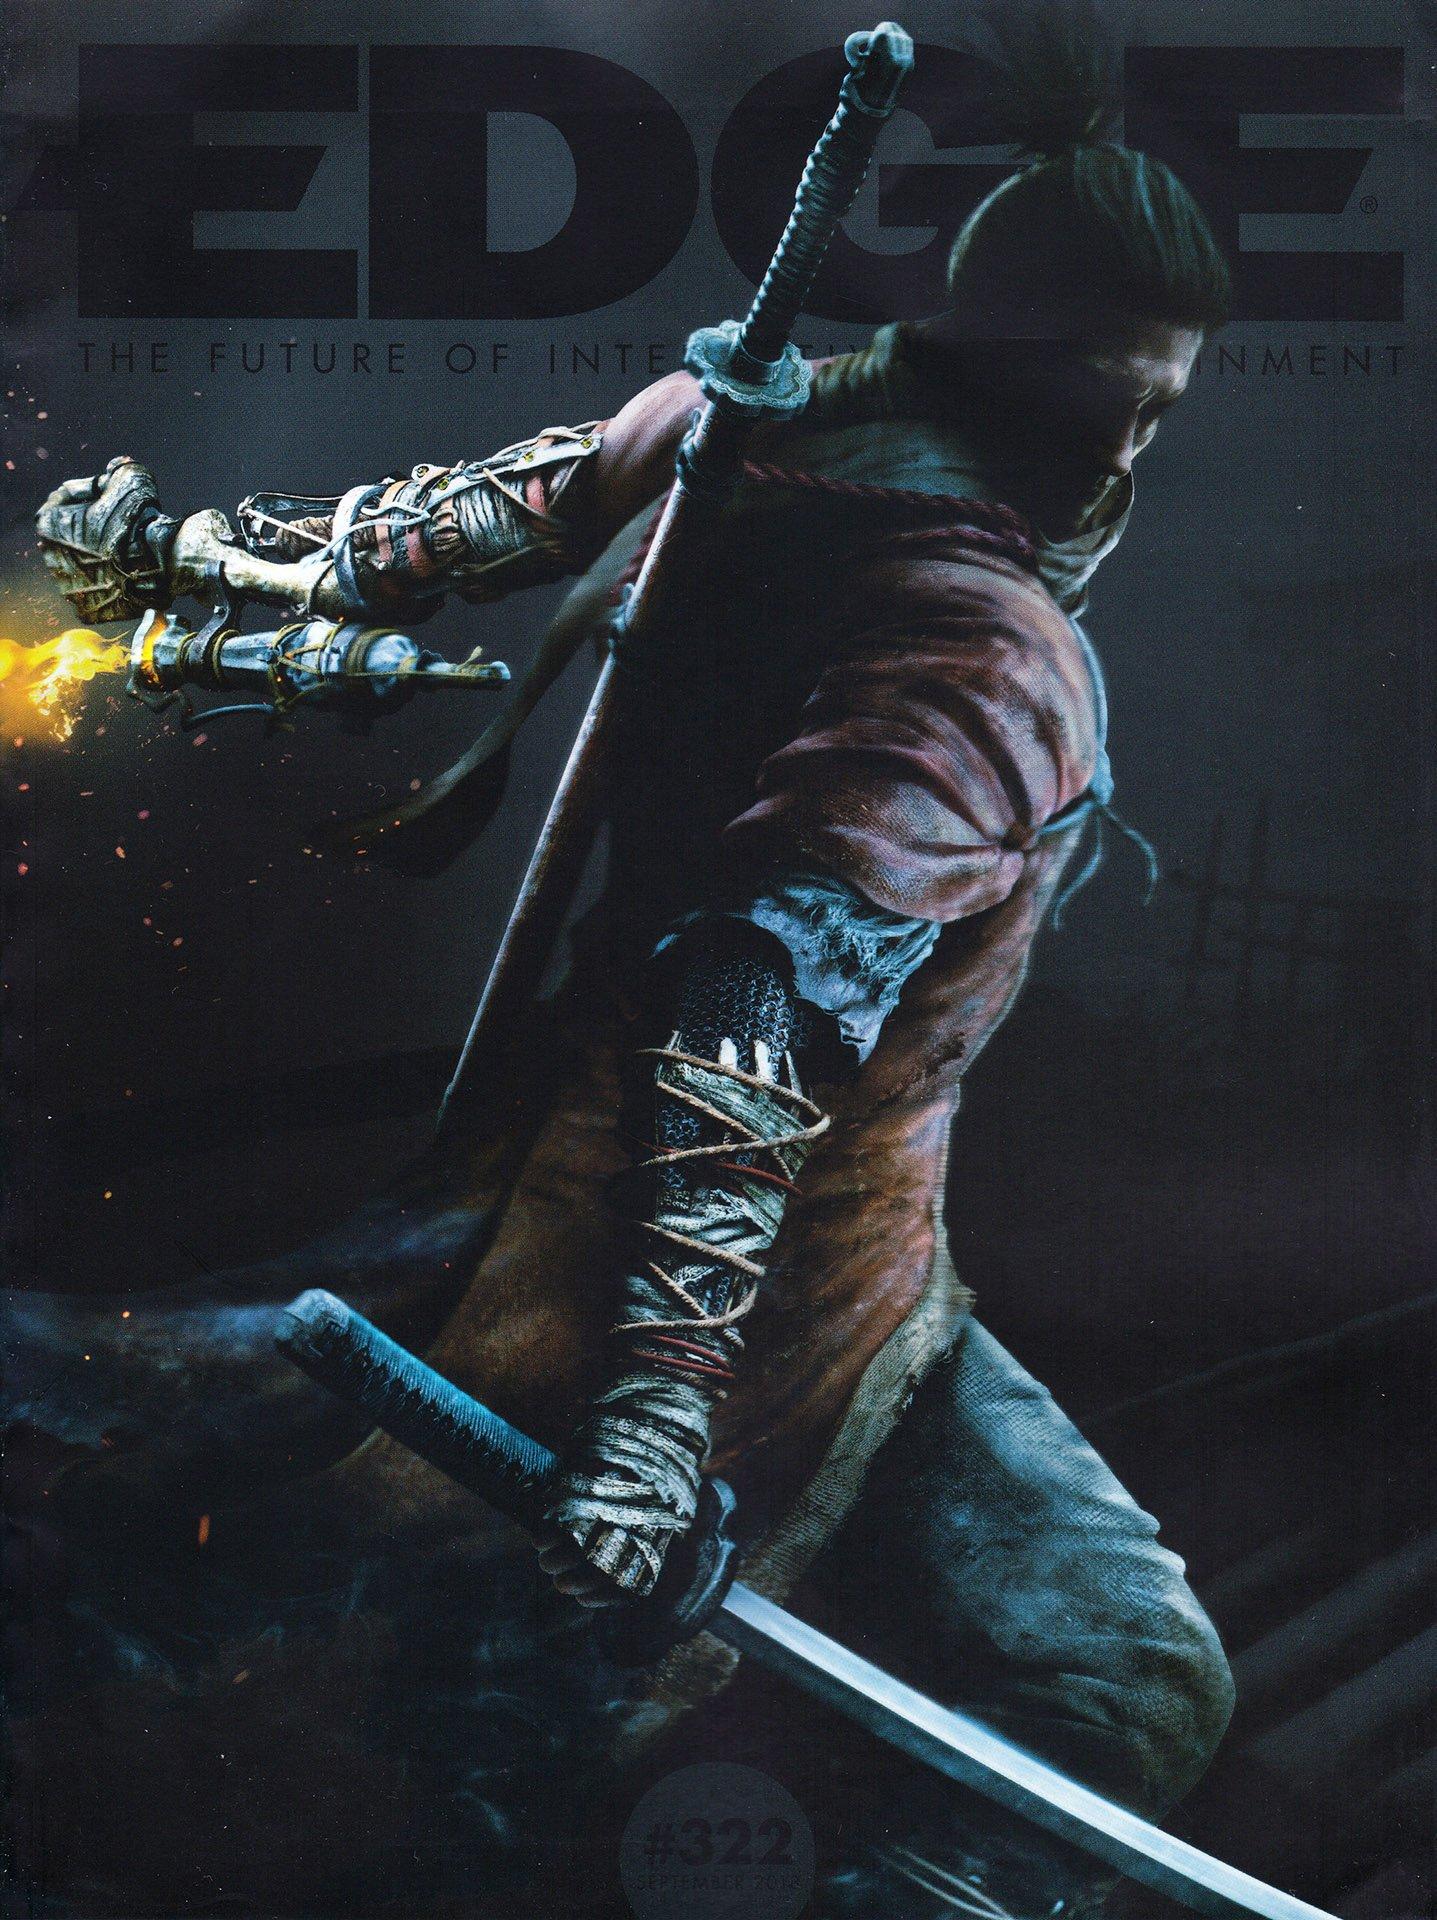 Edge 322 (September 2018) (subscriber edition)